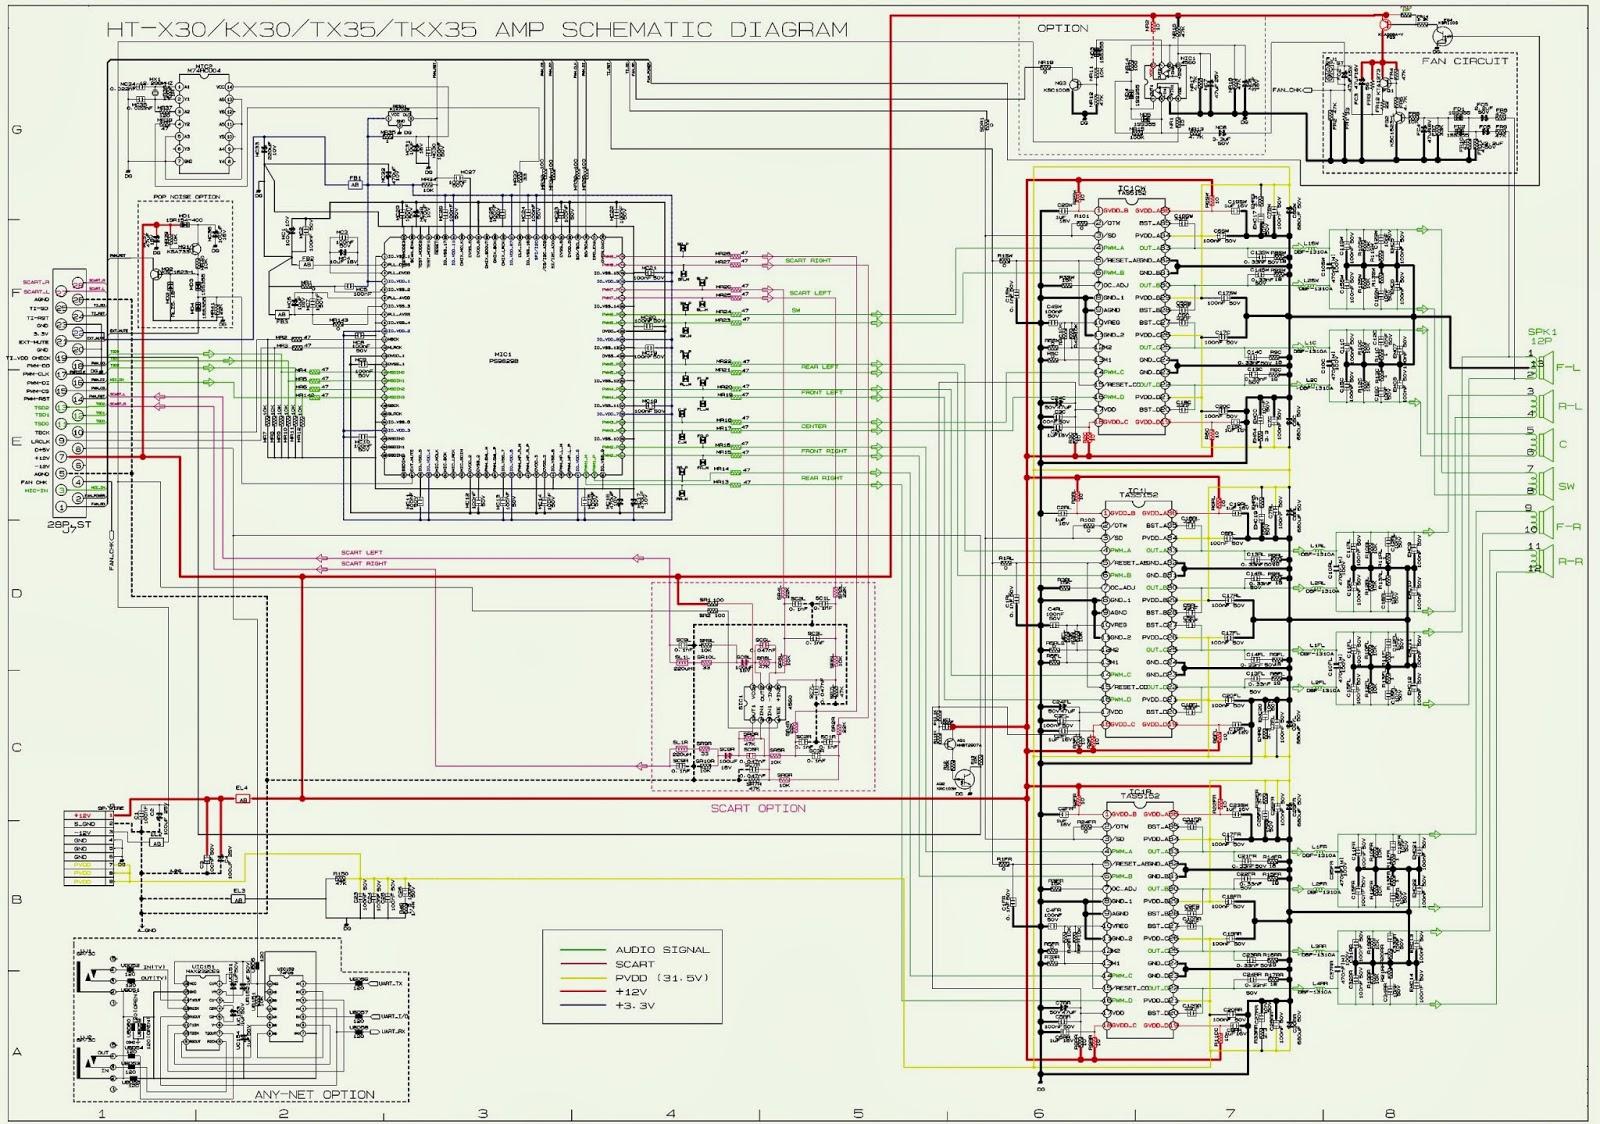 Samsung ht-x30 + ht-x30r service manual & repair guide download m.